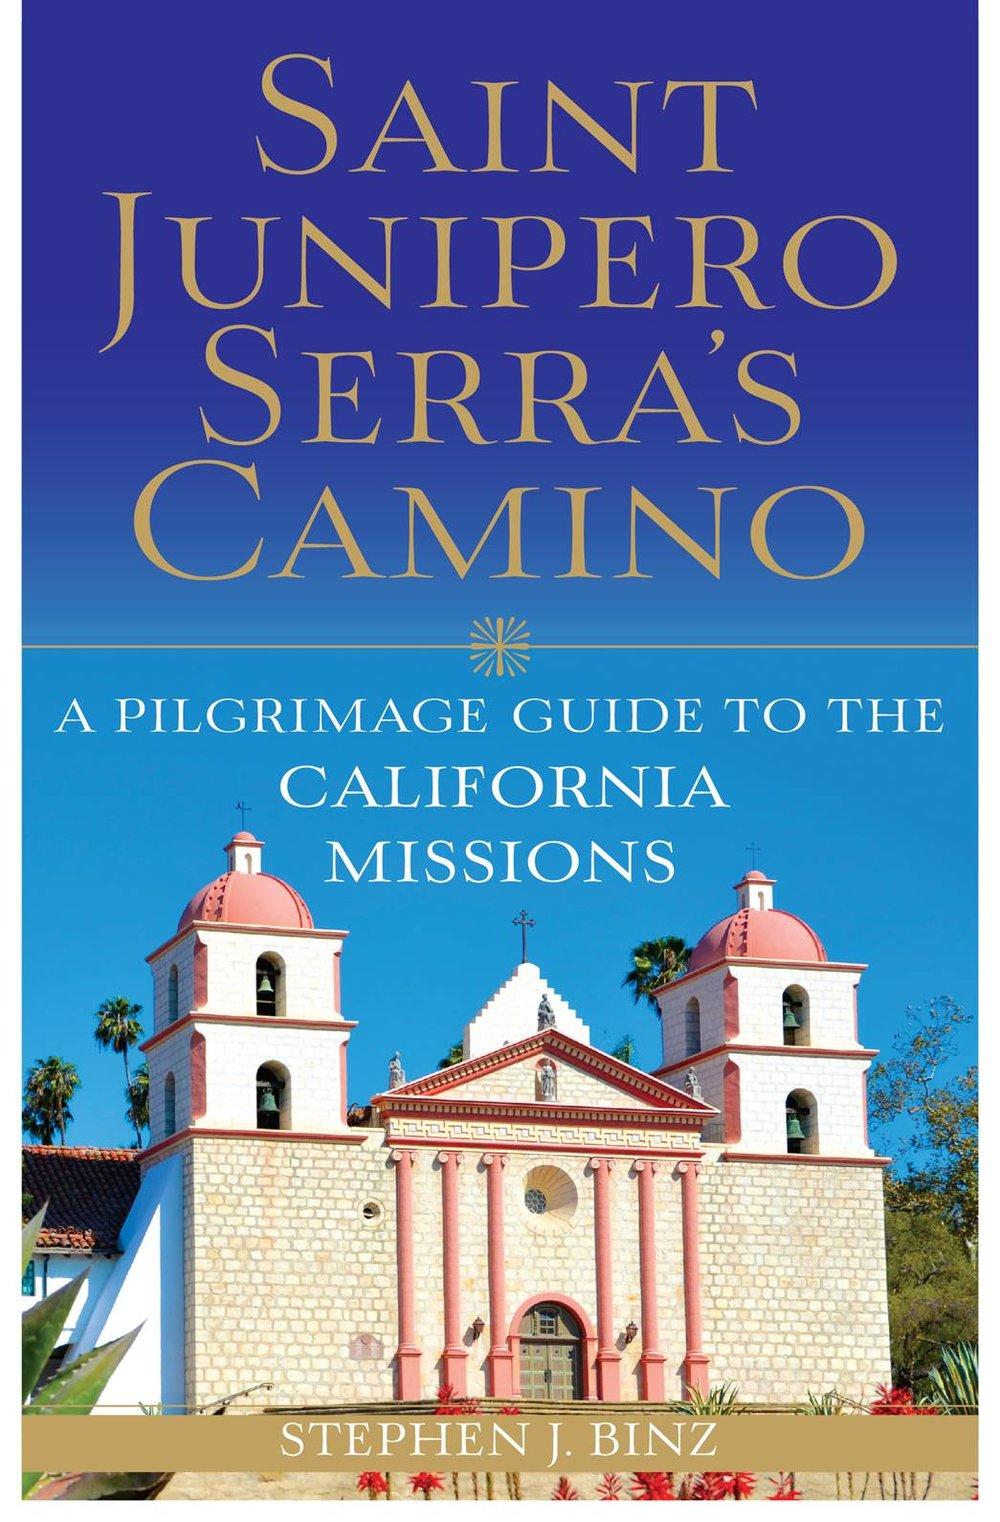 Saint Juniper Serra's Camino cover2.jpg